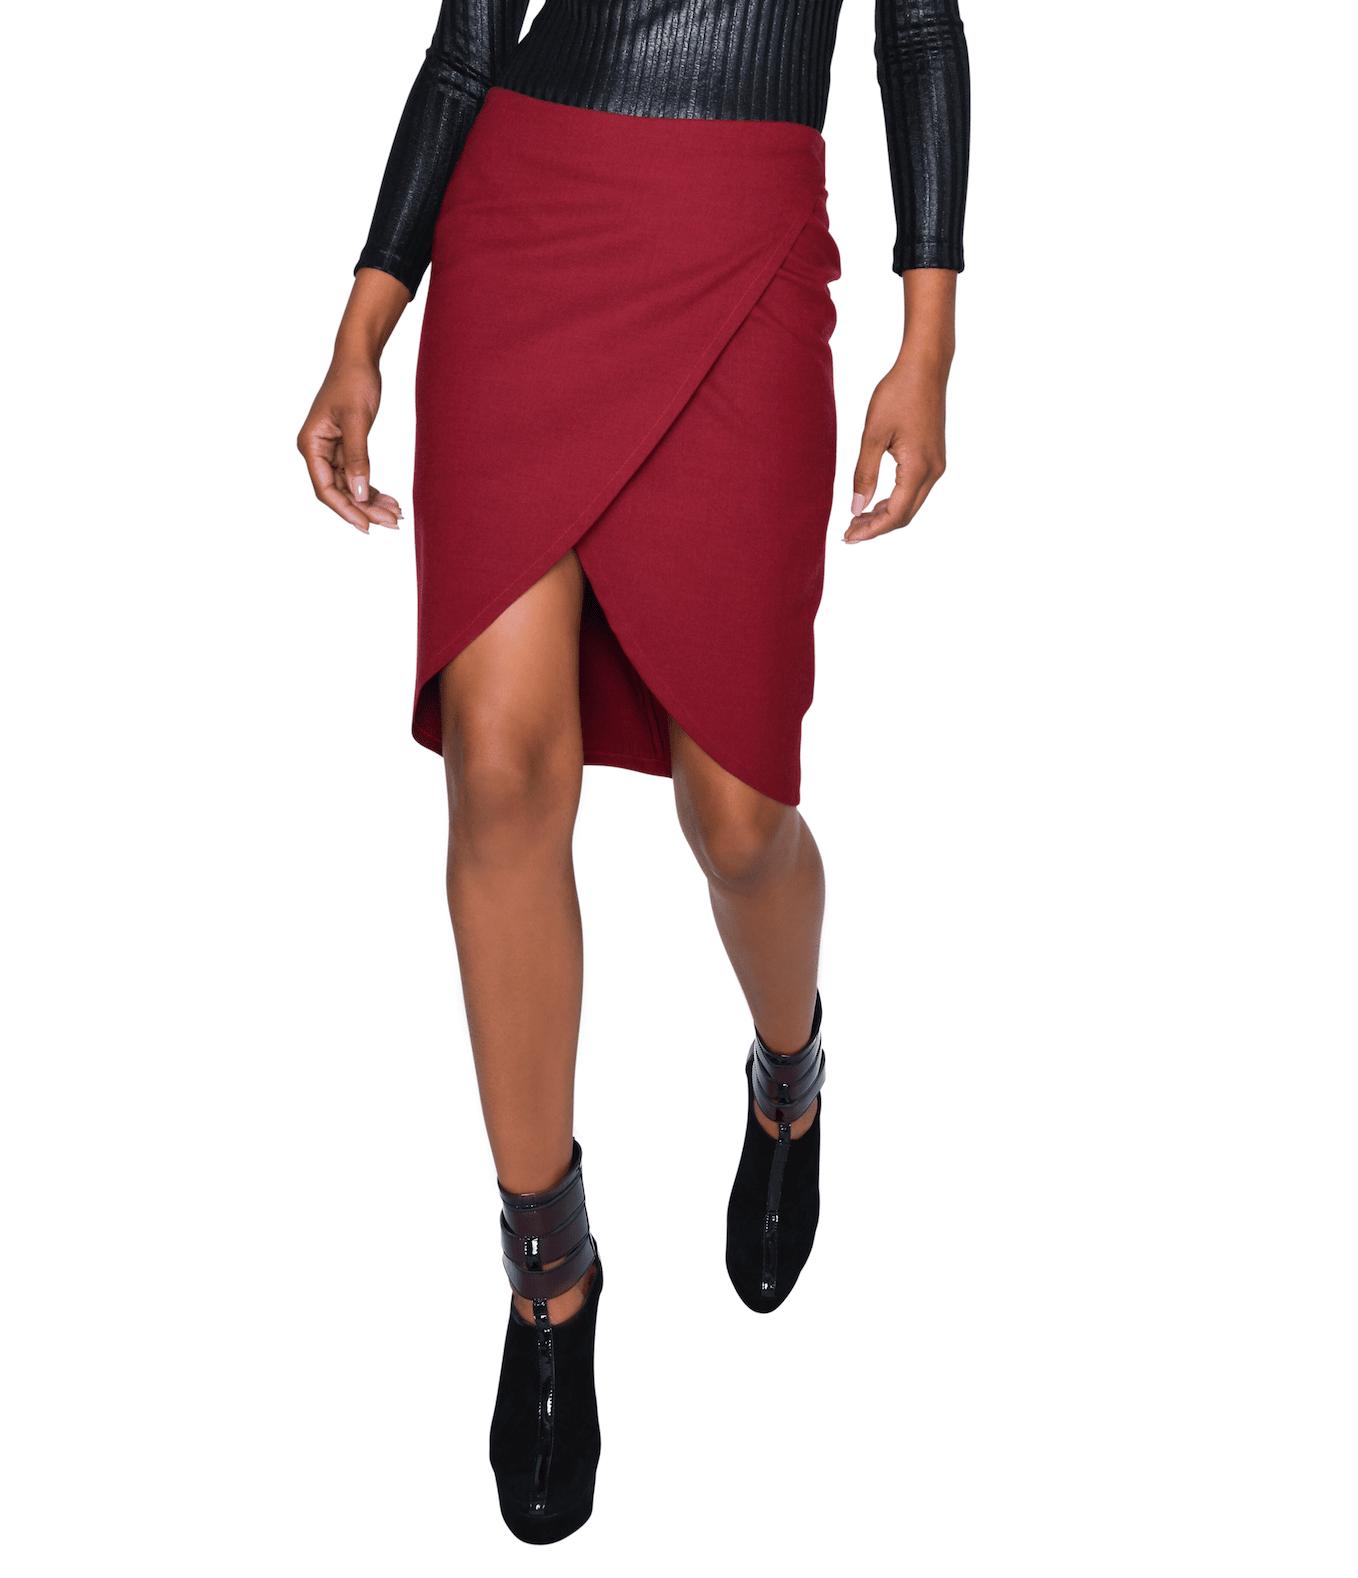 Skirt VENATICI I 1